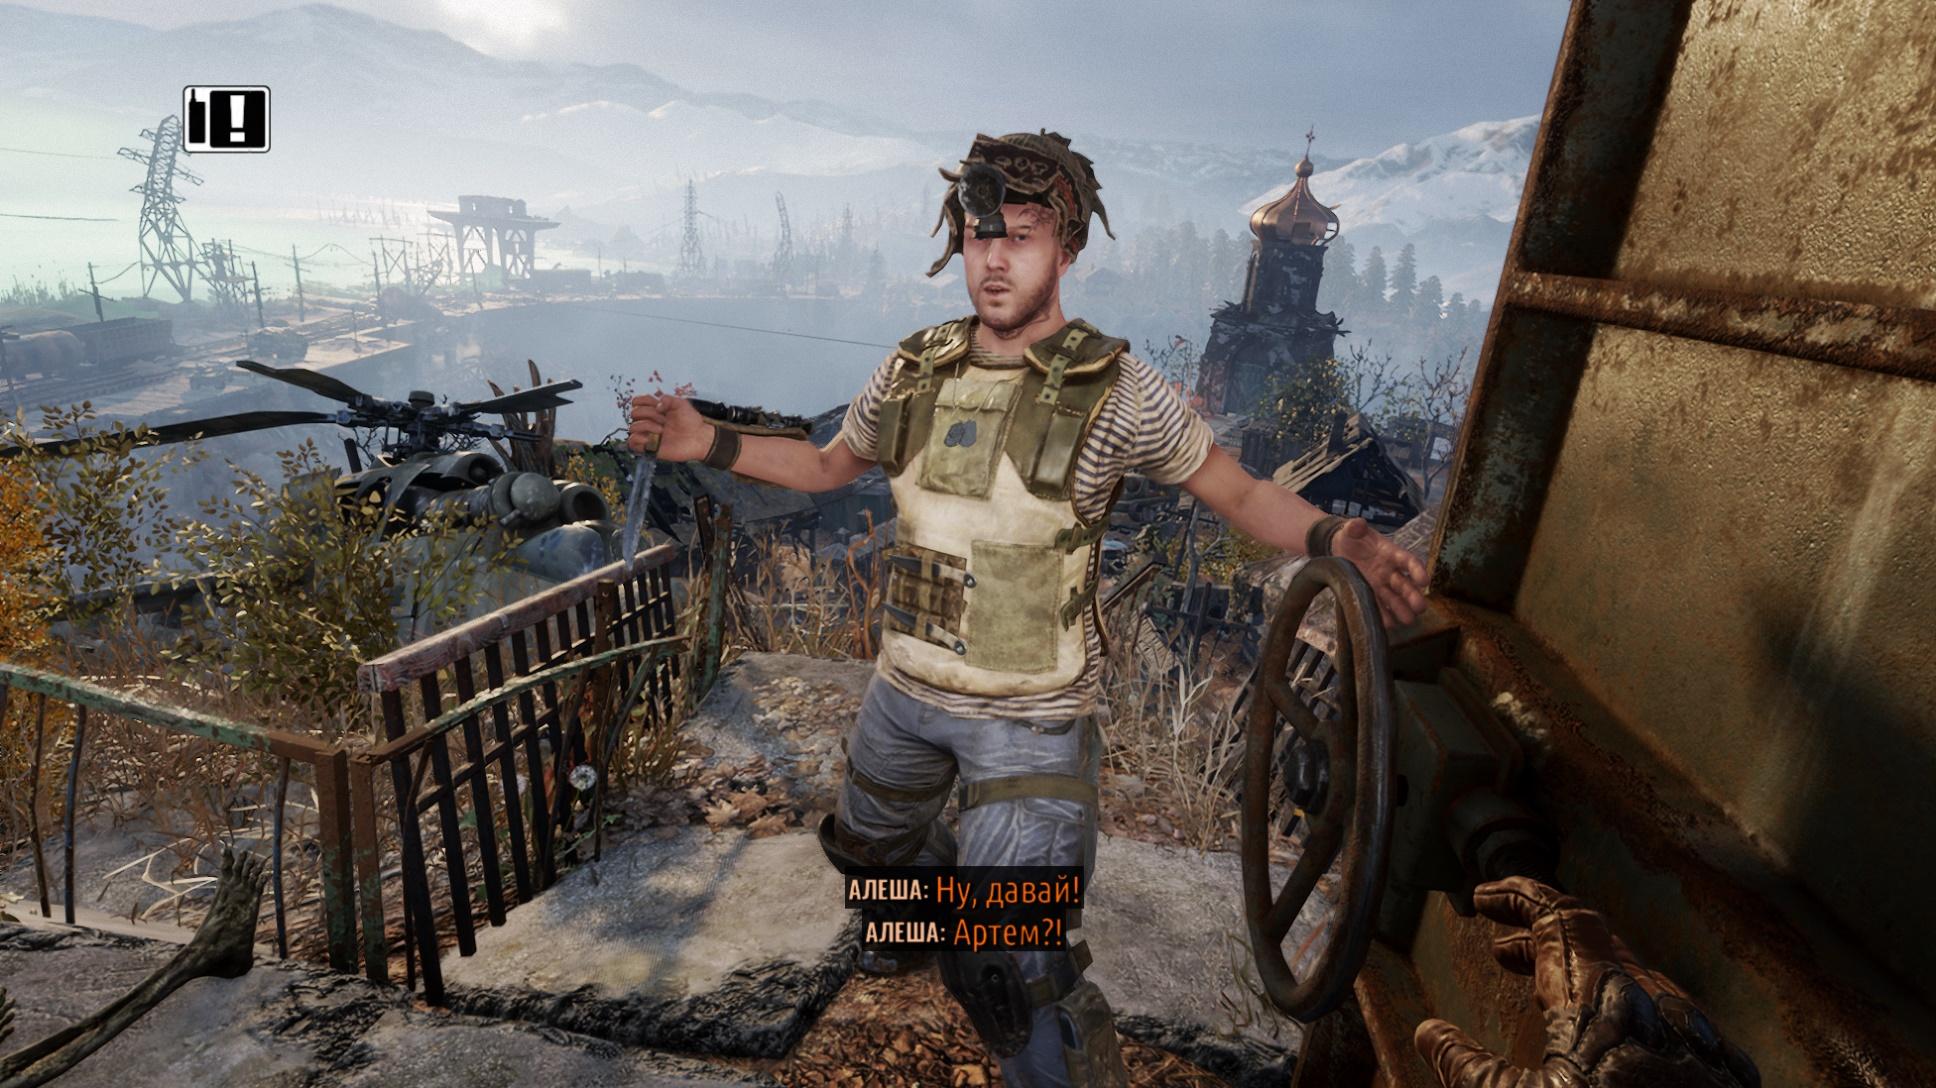 Metro: Exodus - Video Game Guide and Walkthrough